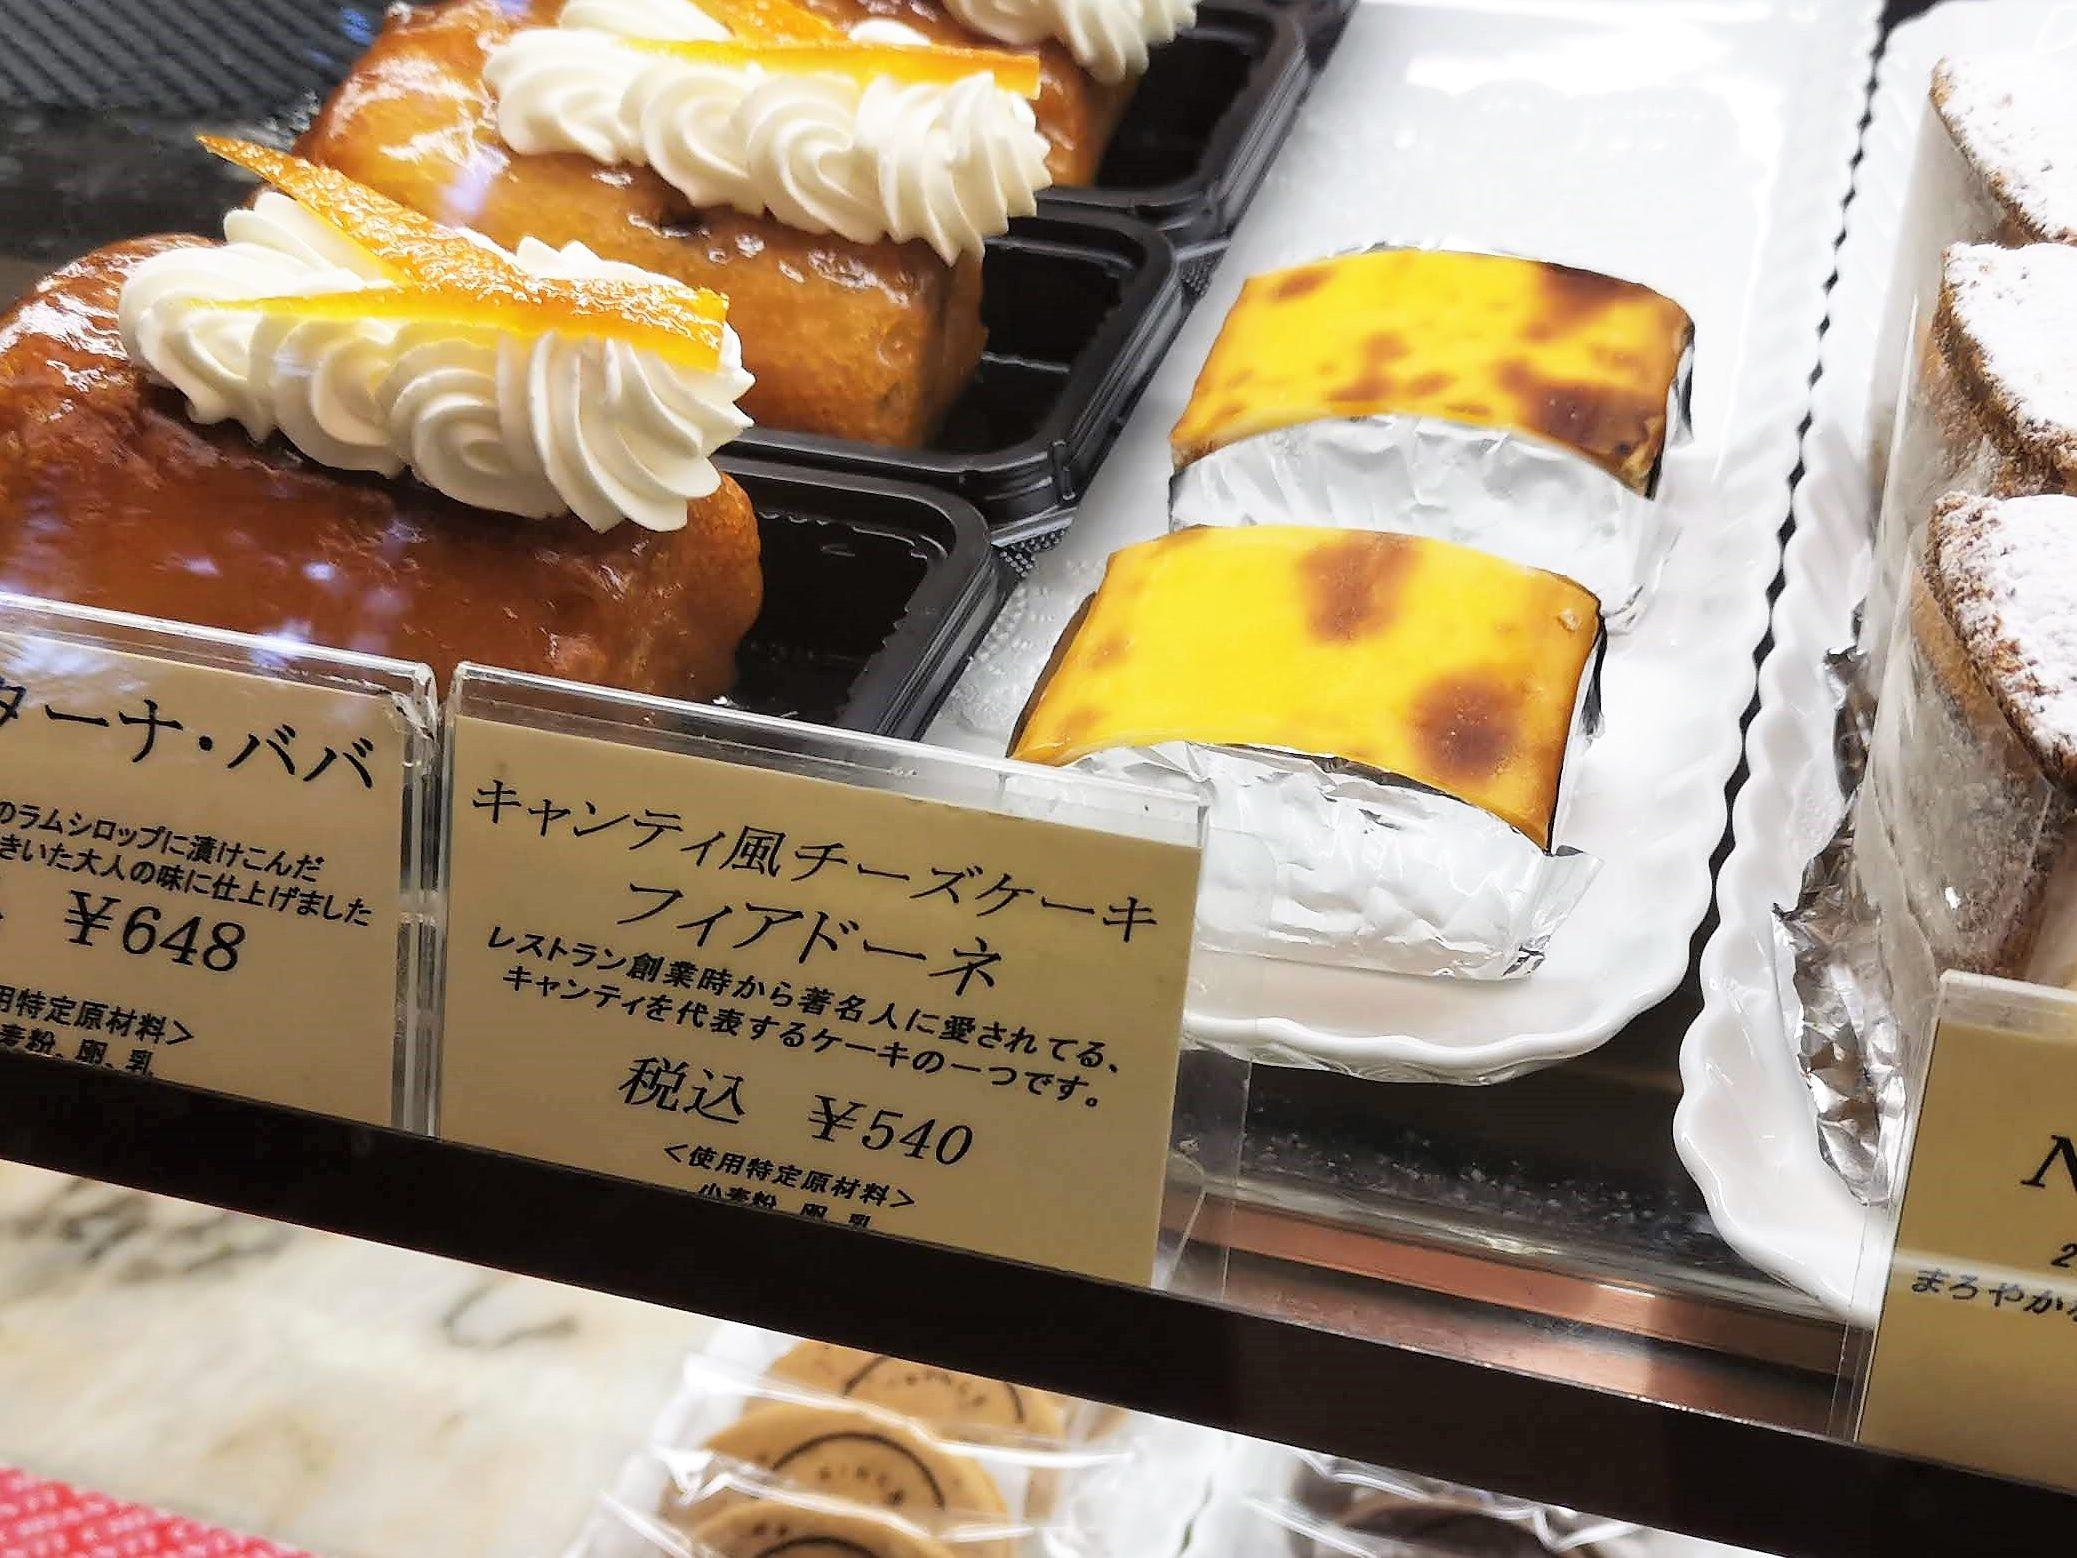 Chianti キャンティ キャンティ風チーズケーキ フィアドーネ (23)